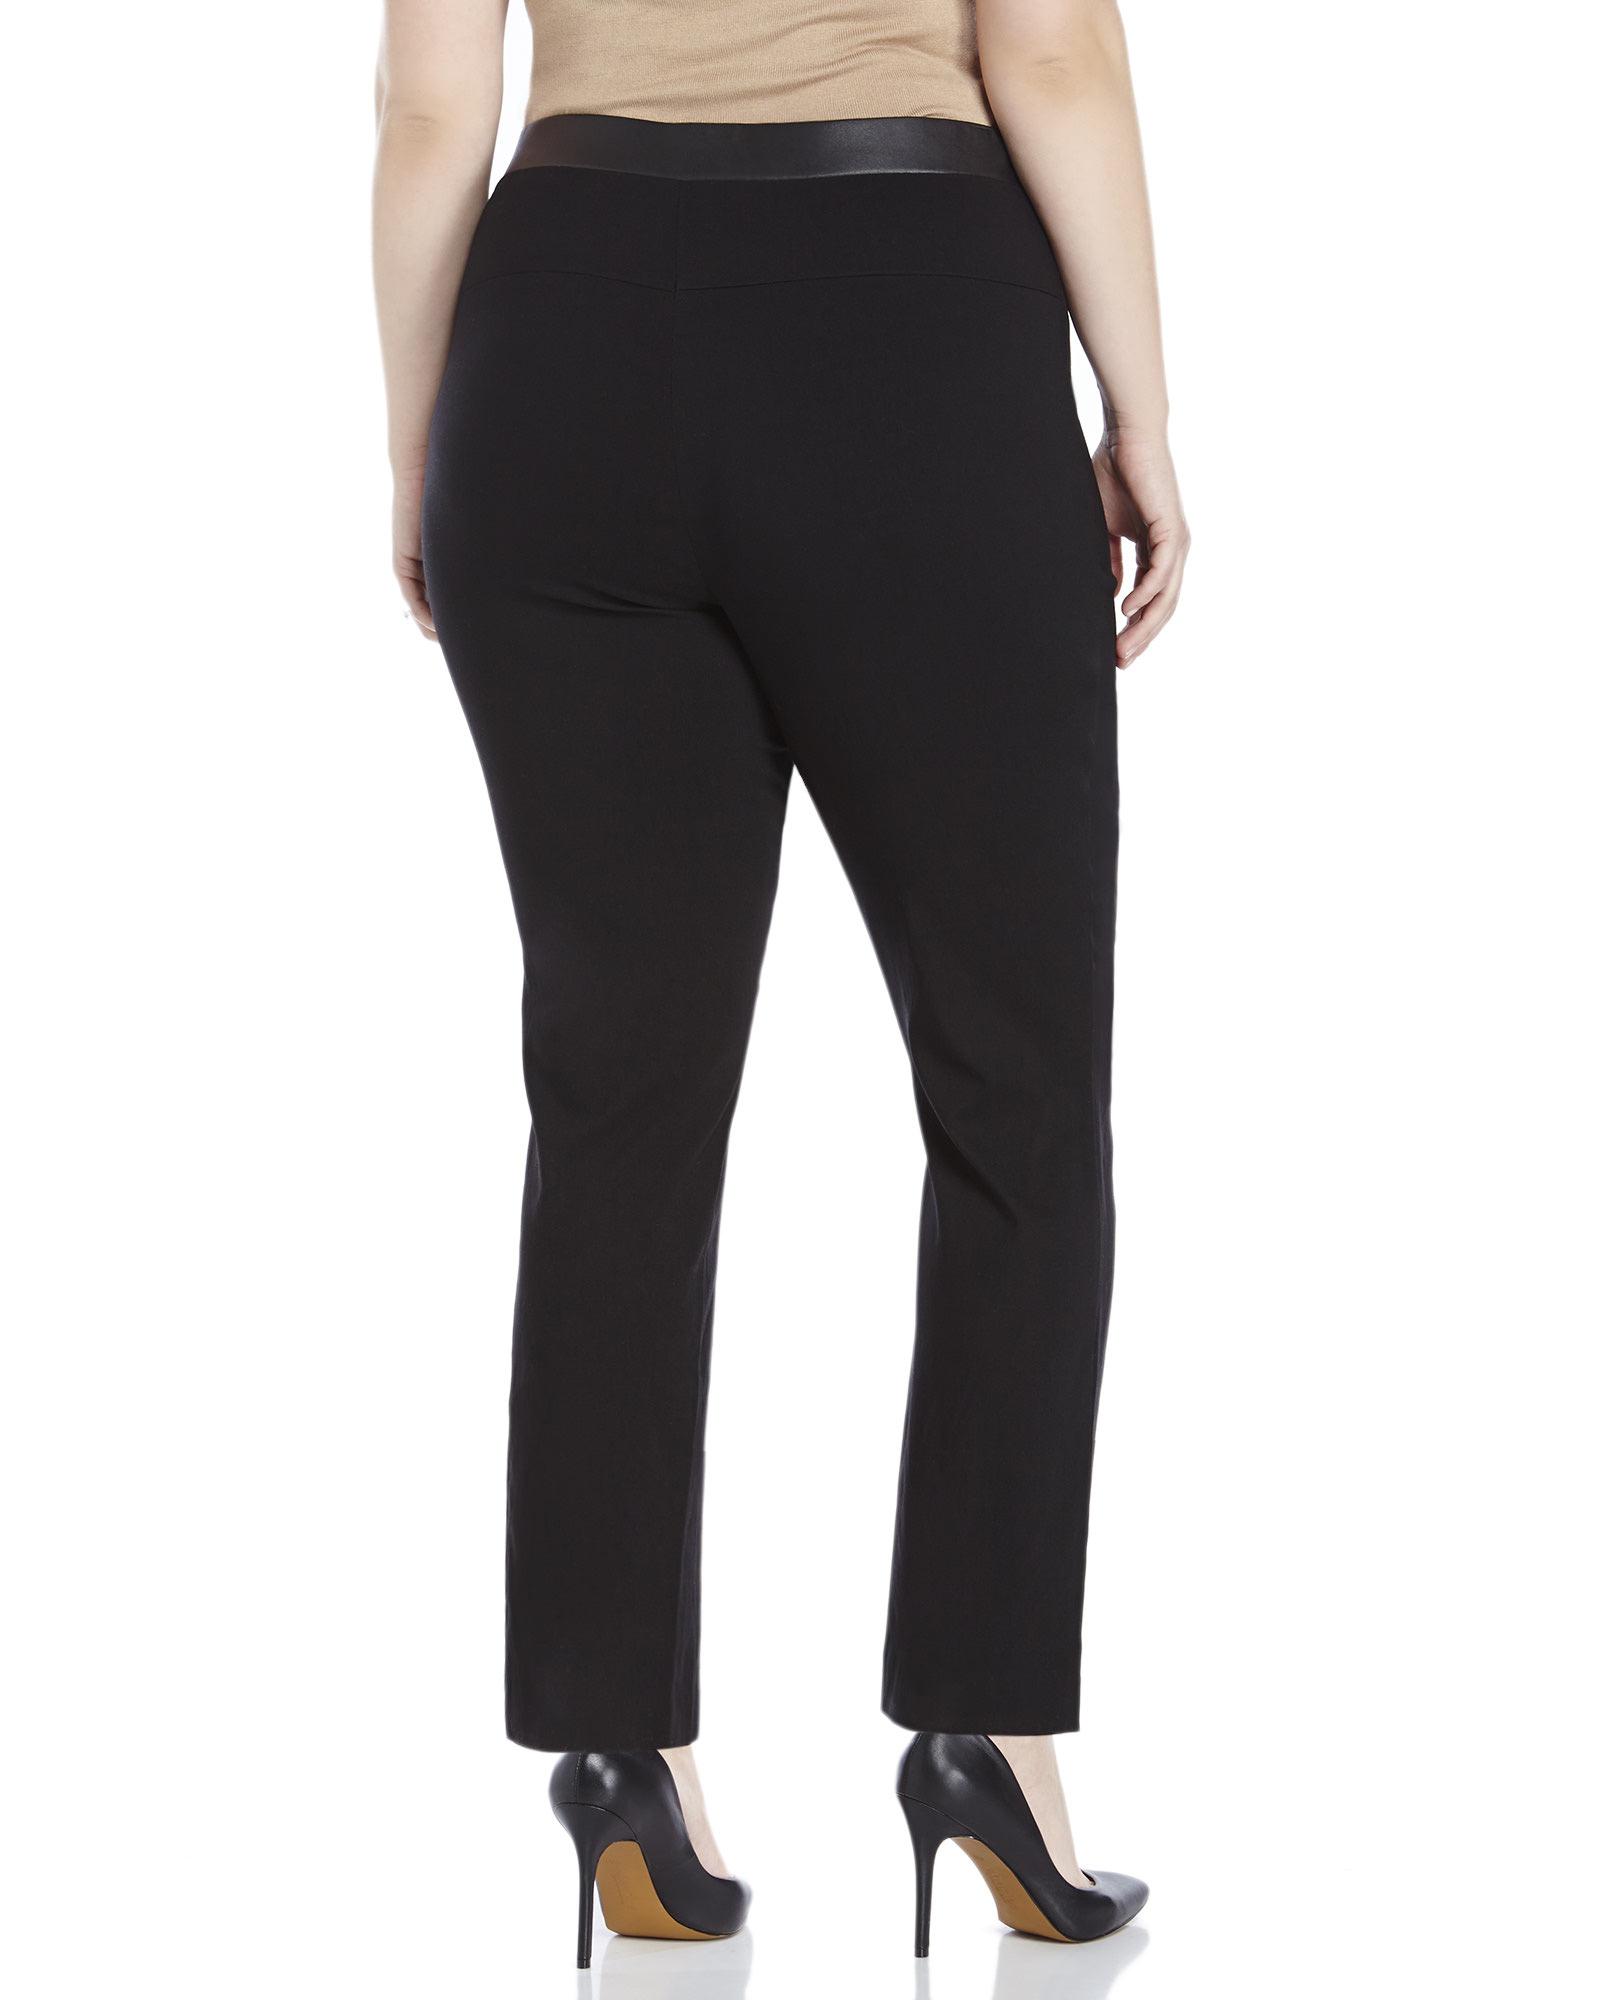 538db77f285 Lyst - Rafaella Plus Size Comfort Fit Faux Leather Trim Pants in Black